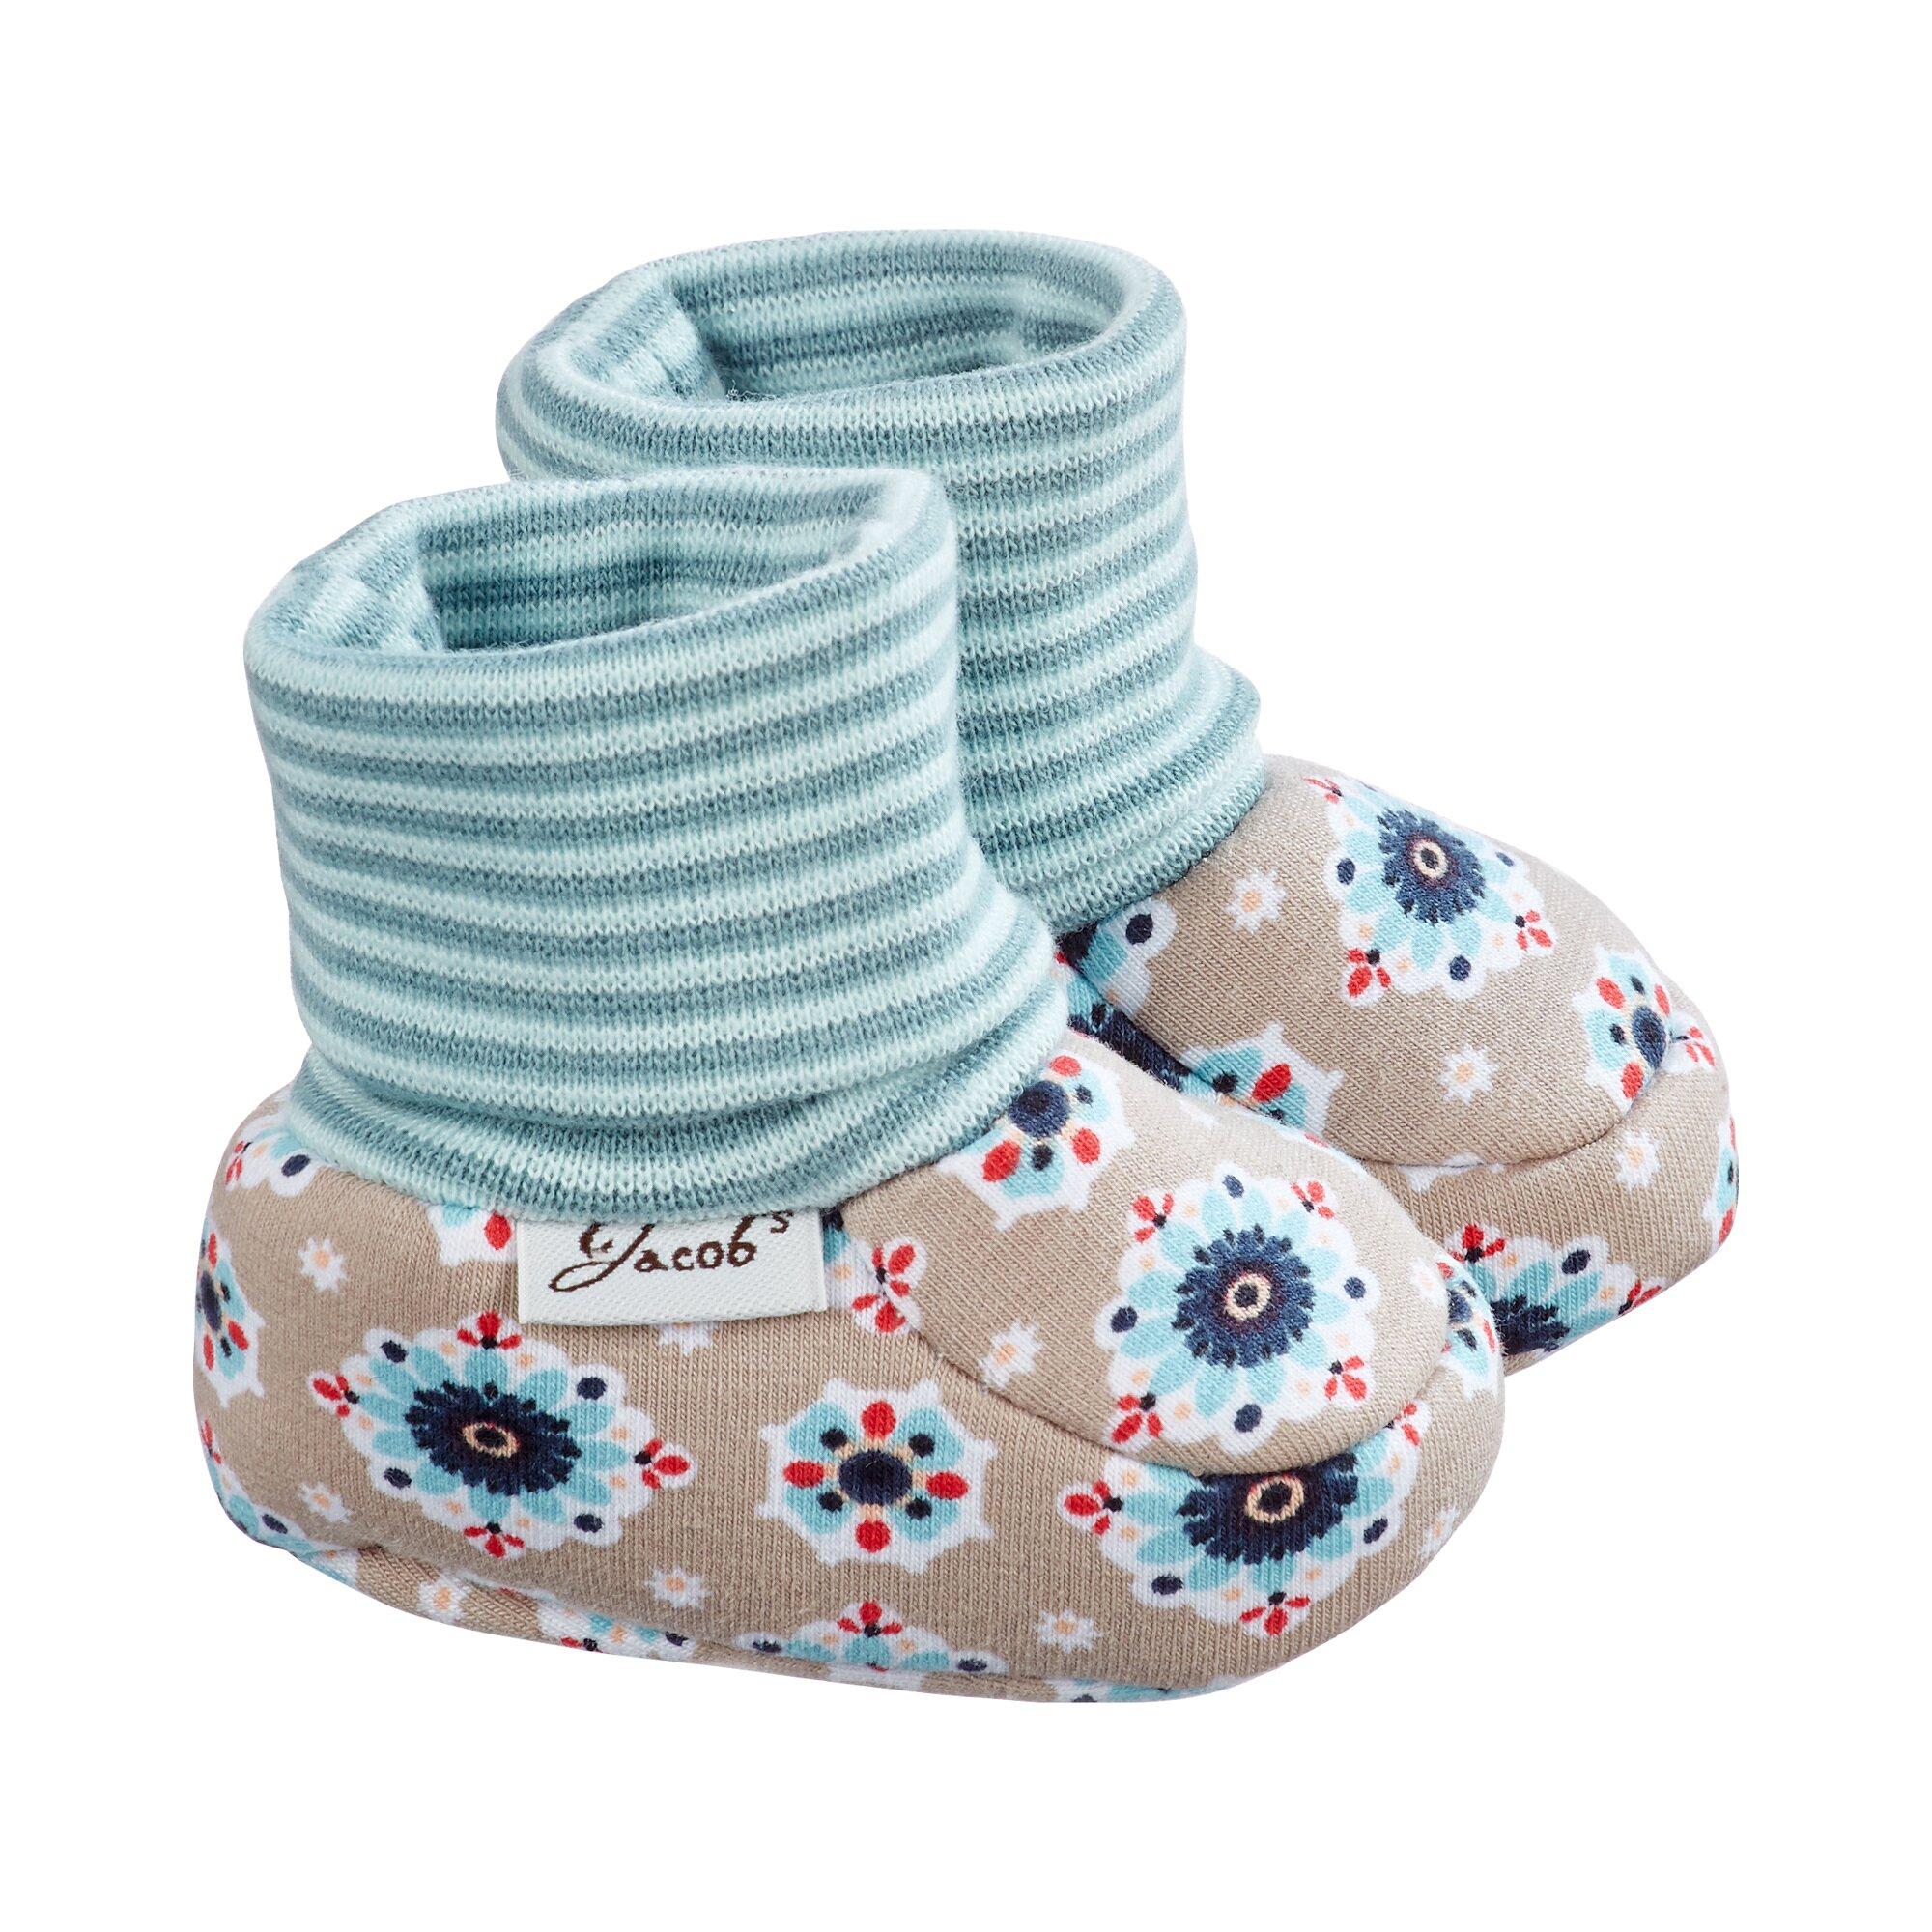 Jacob's Baby-Schlupfschuhe Ornamente